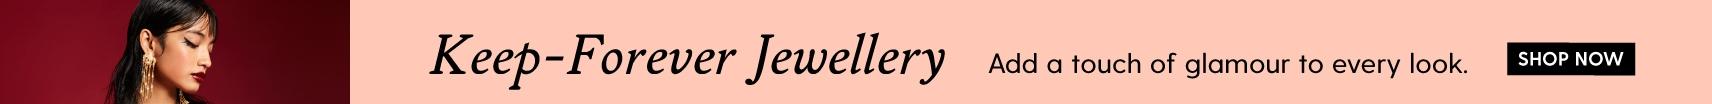 jewellery/?designers=radhikaagrawaljewels-bblingg130-flowerchildbyshaheenabbas-opalina130-outhouse130-valliyanbynityaarora-zohra130-esme130-ritikasachdeva-aetee130&=&utm_source=PDPPage&utm_medium=Banner&utm_campaign=Sparking-New-Jewels